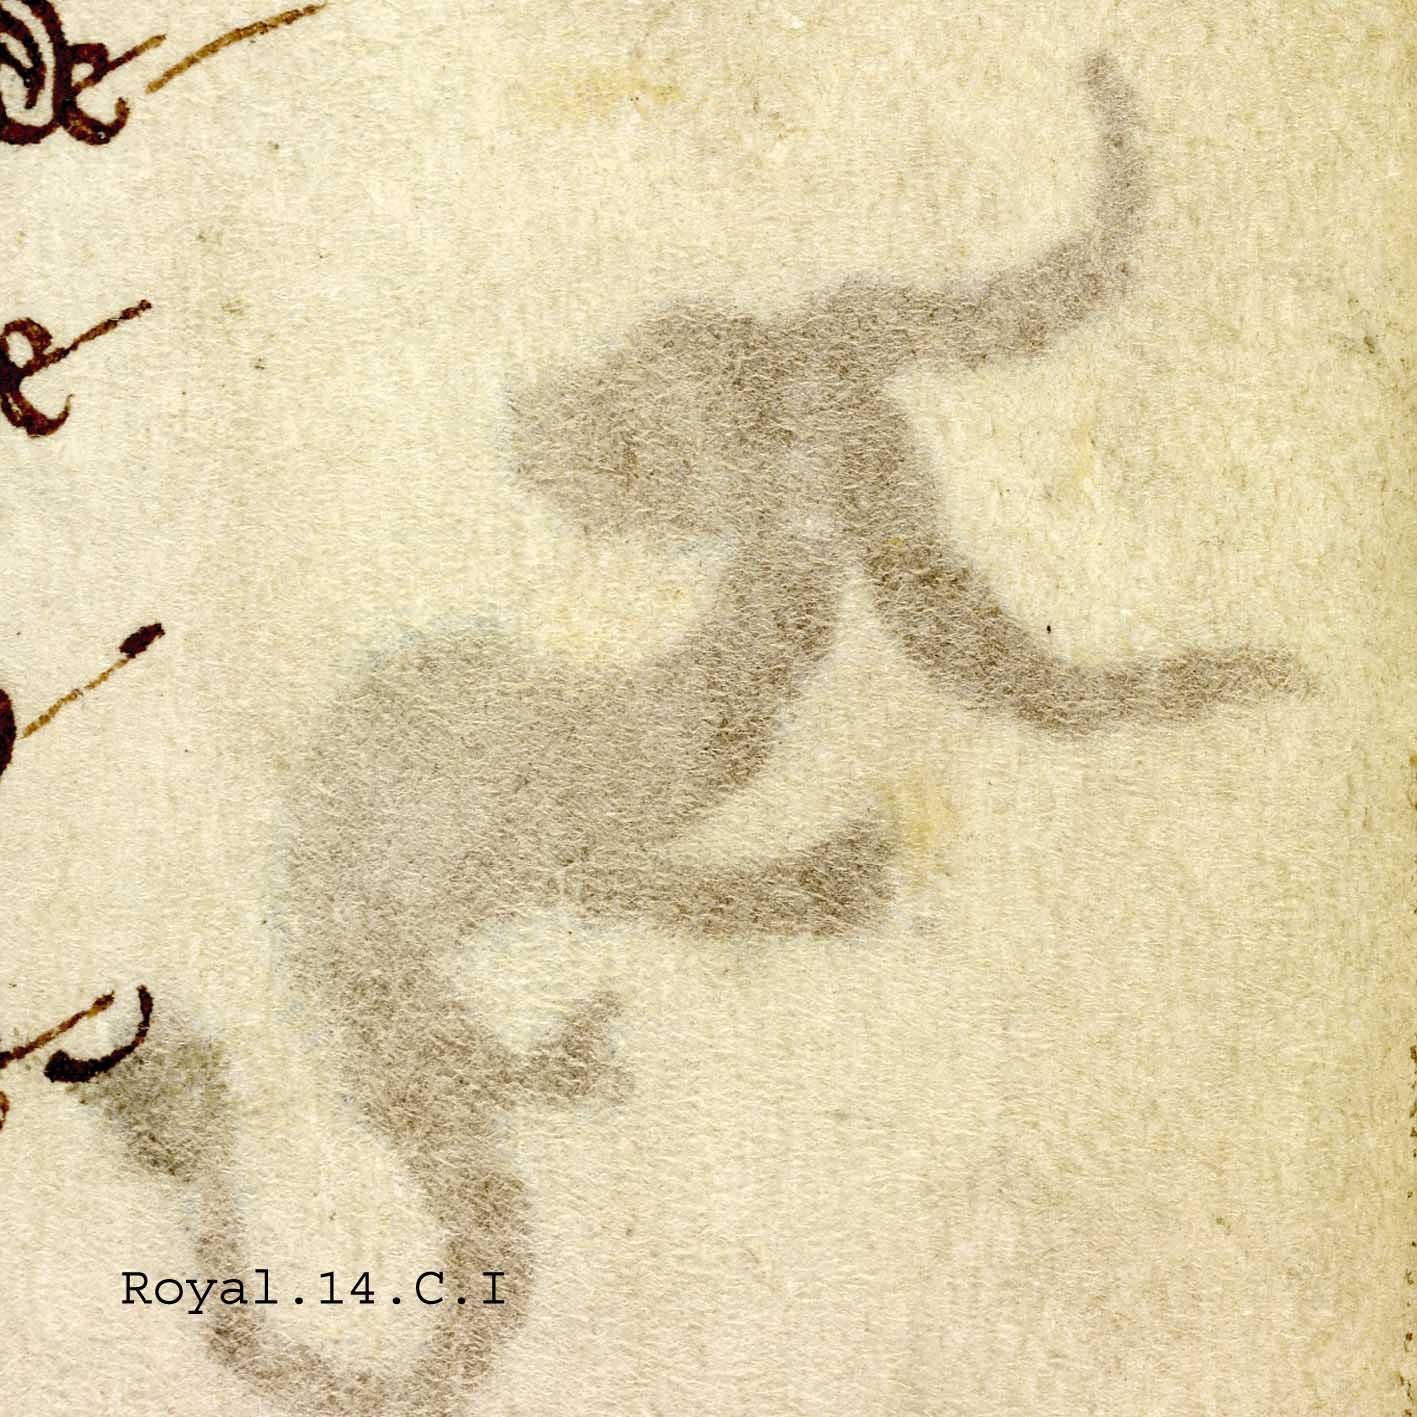 14CI-B copy.jpg